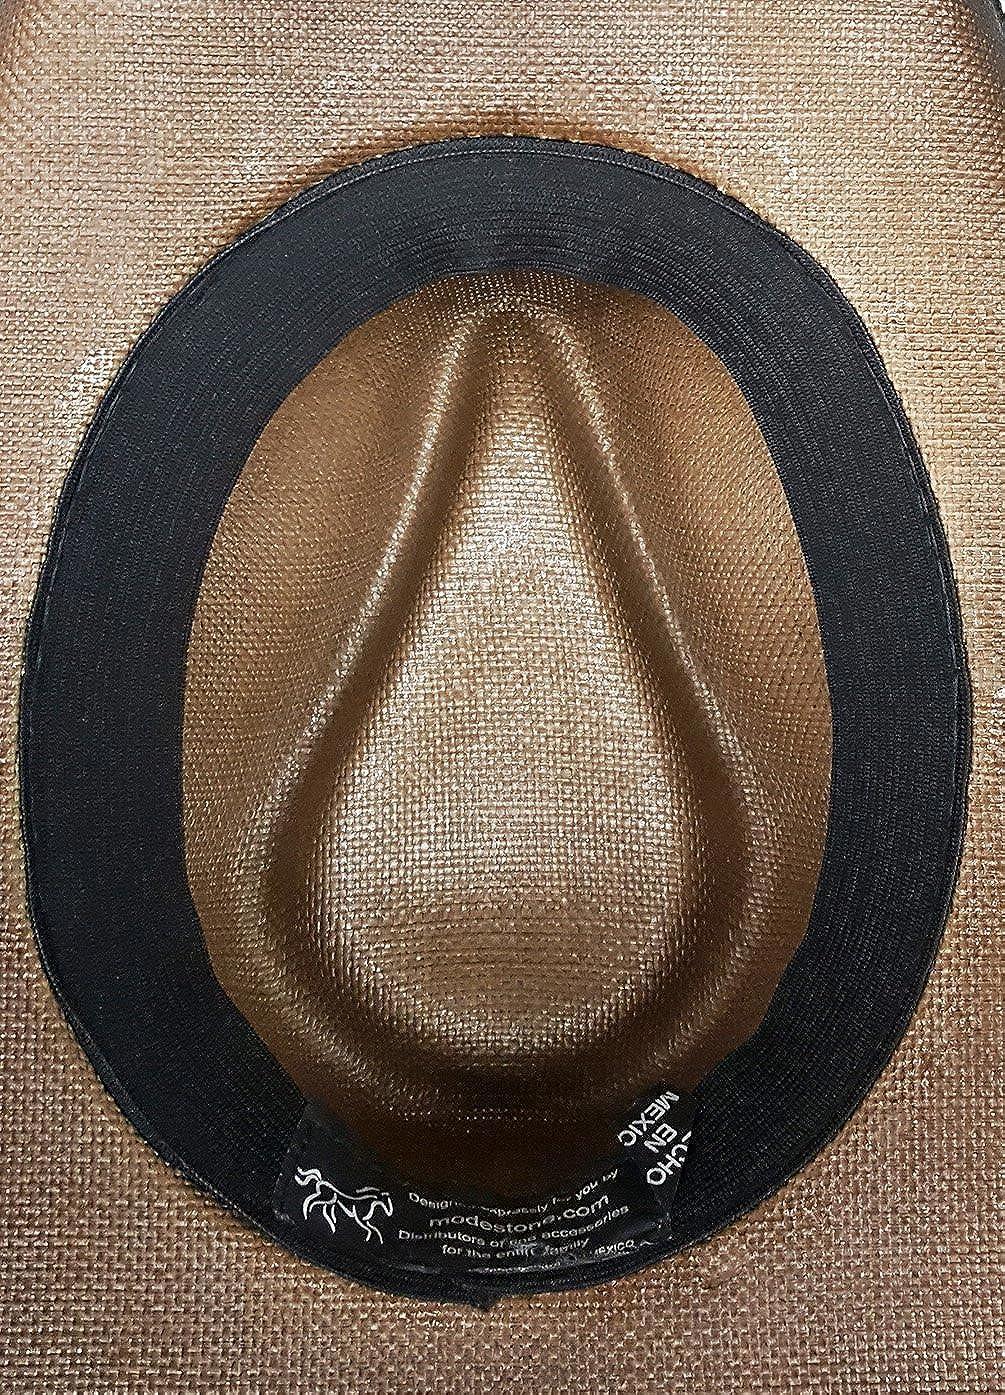 4f7035ac032ce Modestone Straw Cowboy Hat Metal Texas Sheriff Star Concho   Chain Links  Hatband  Amazon.ca  Clothing   Accessories